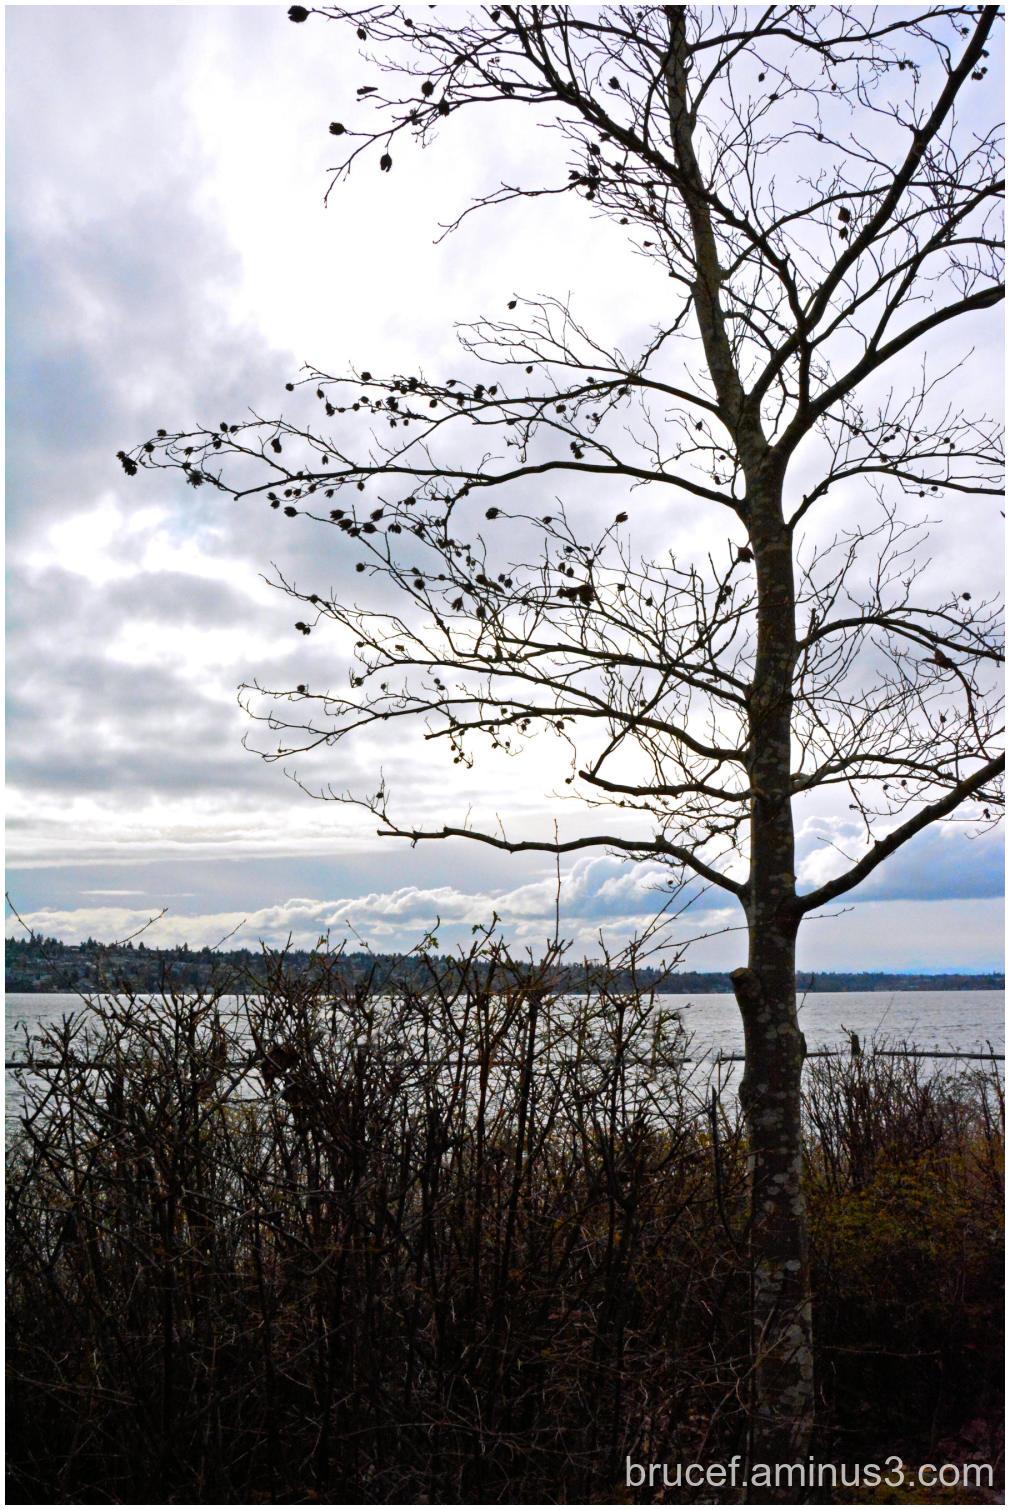 Dreary day at the Lake